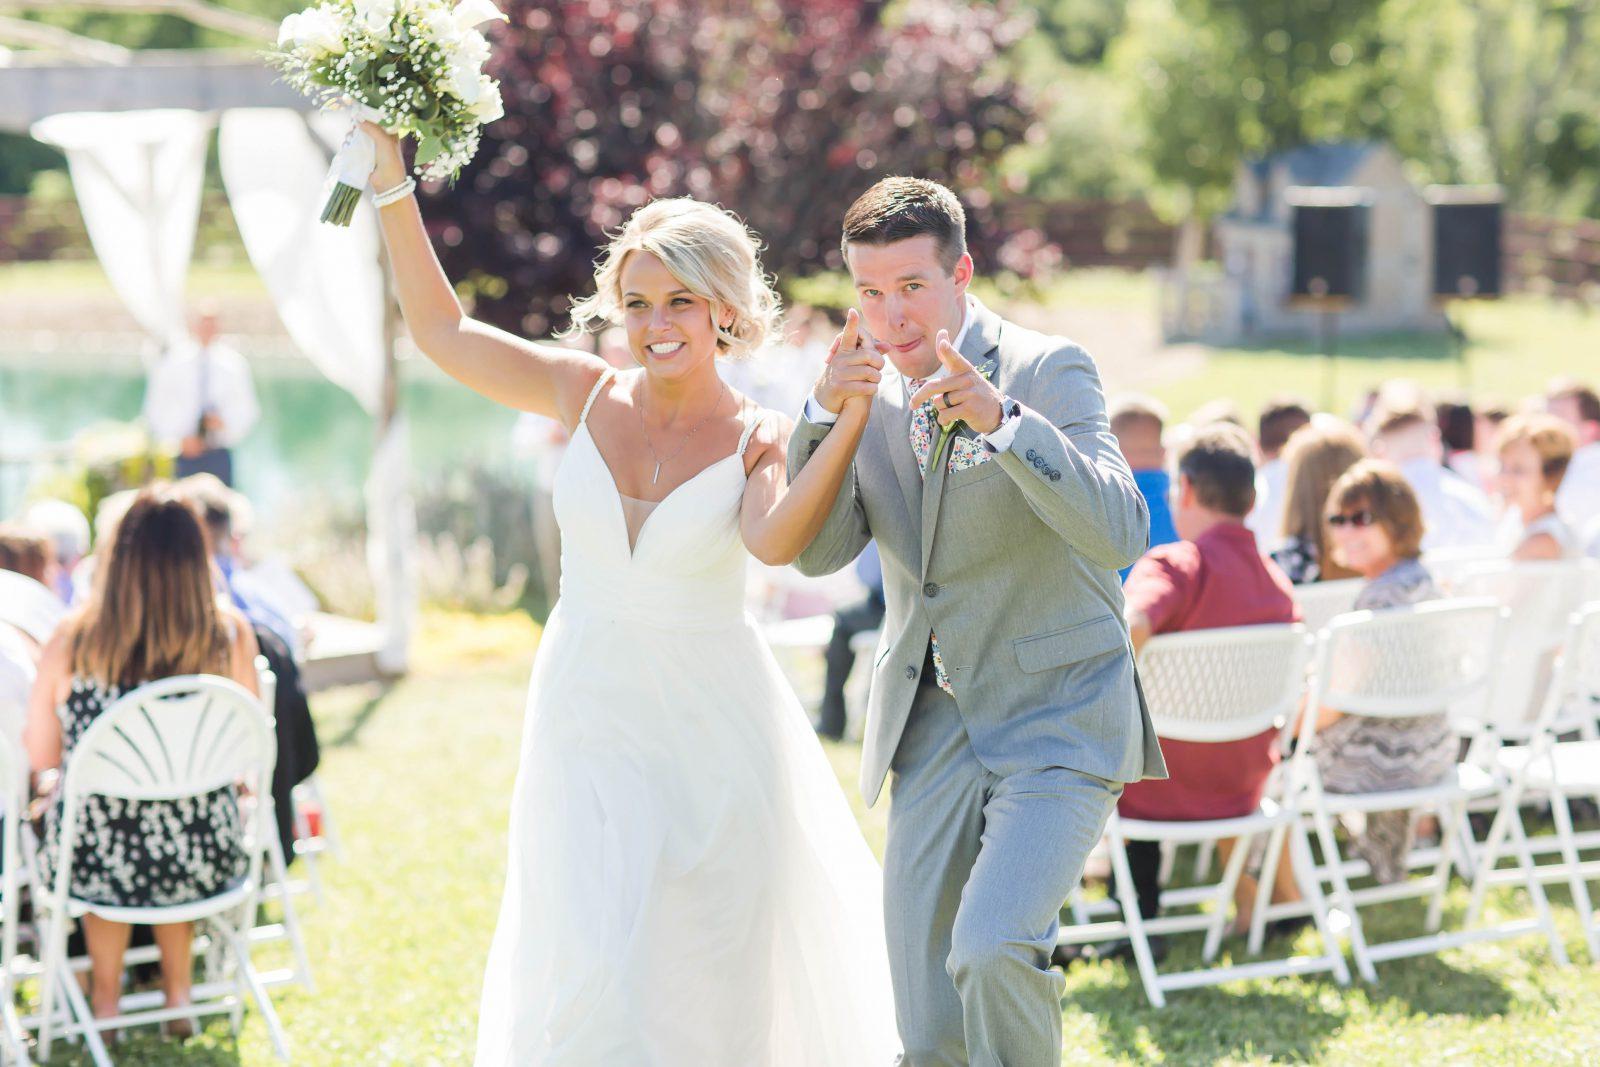 peacock-ridge-summer-wedding-photographer-akron-ohio-loren-jackson-photography-83